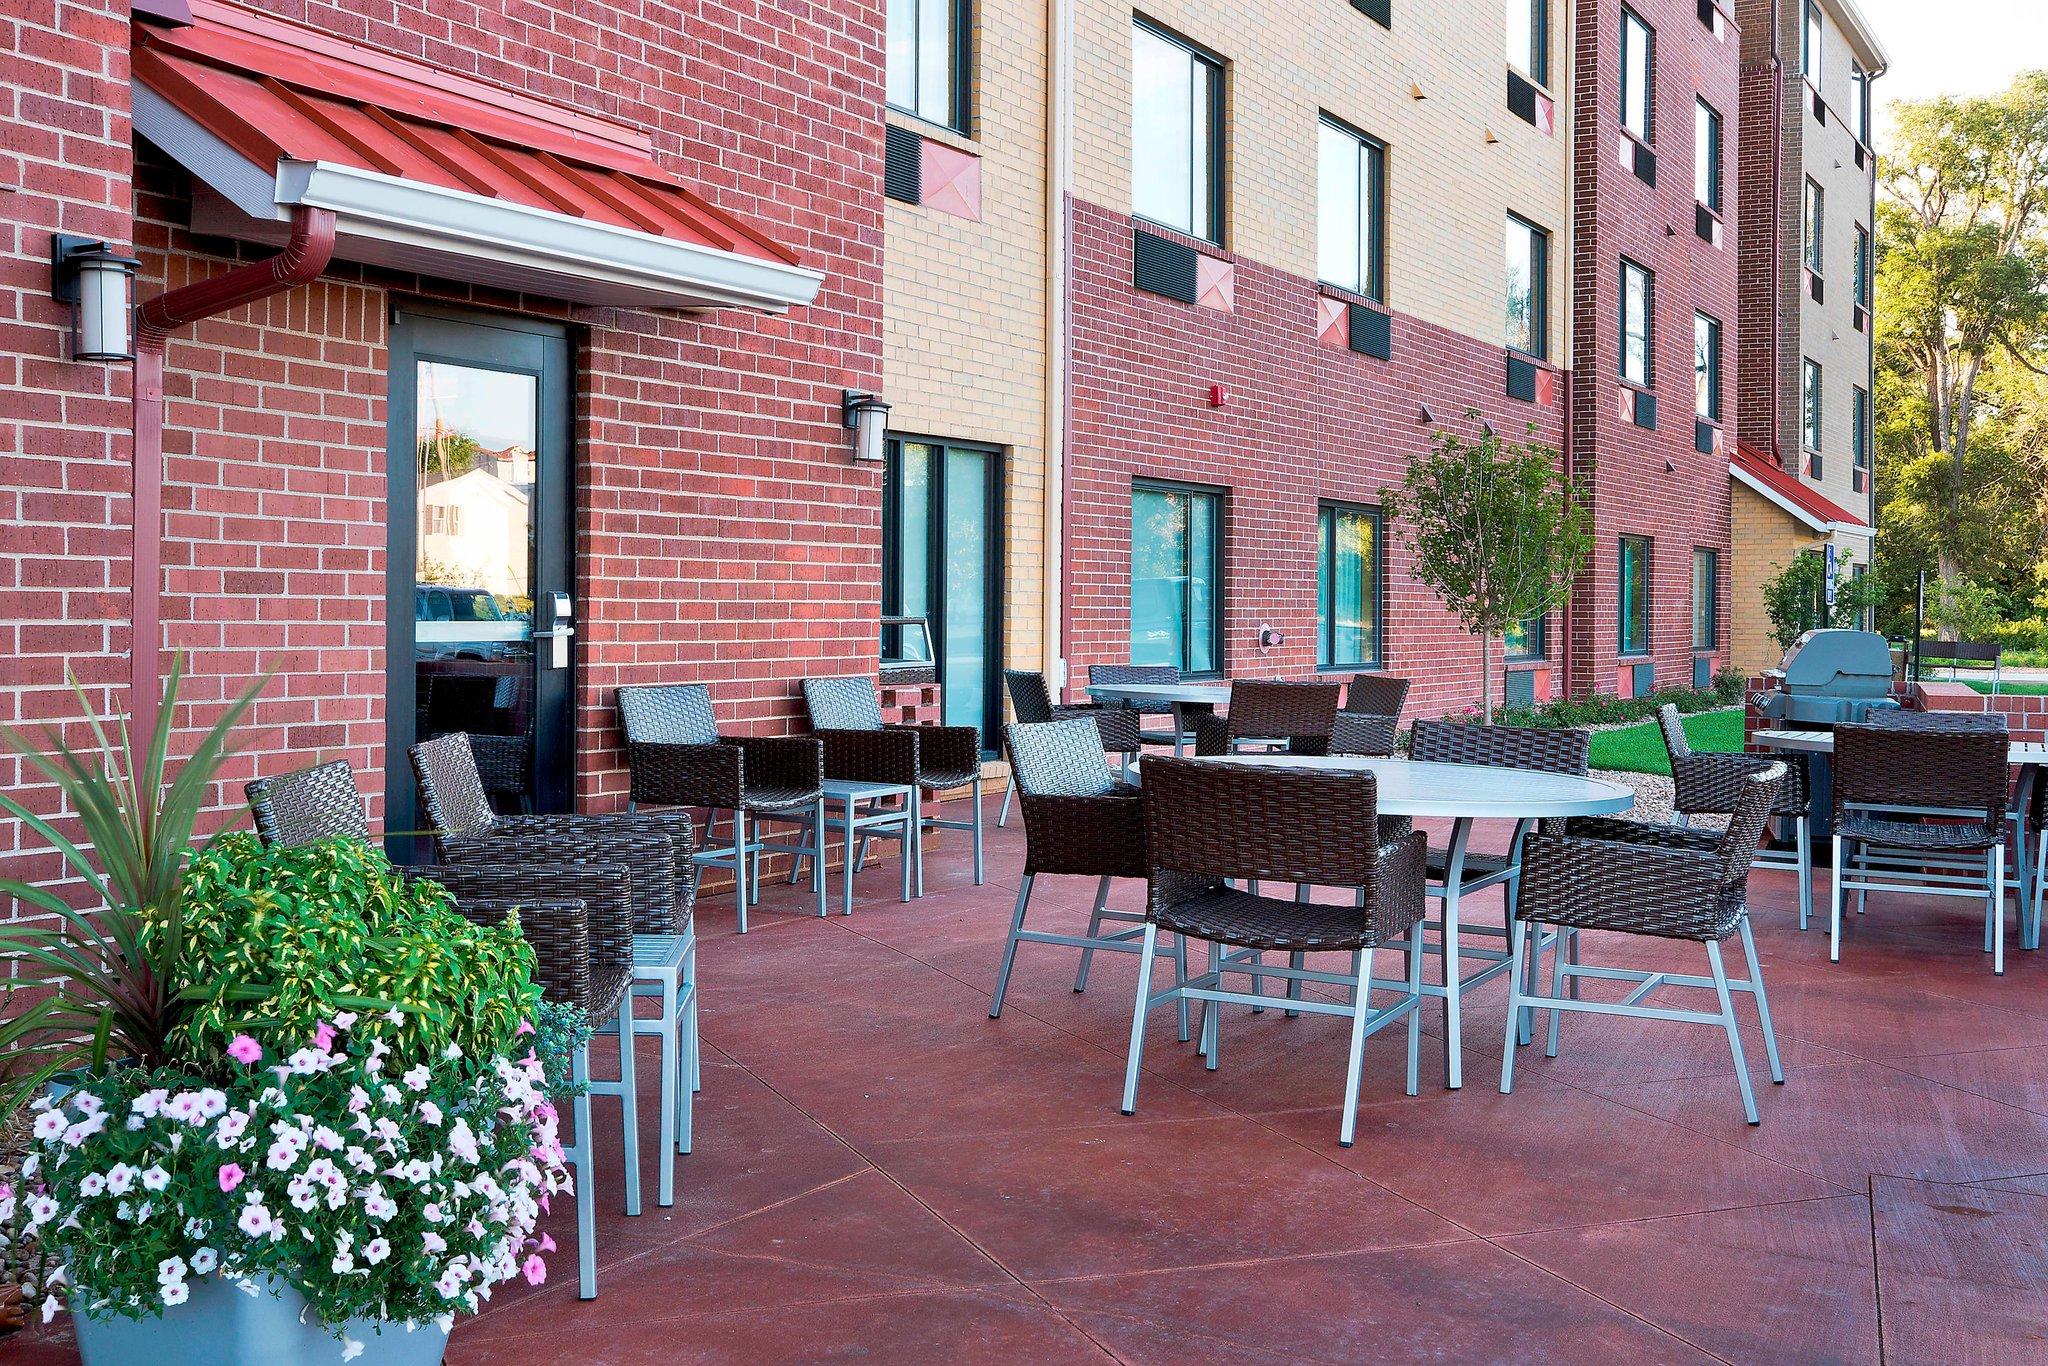 TownePlace Suites Dodge City